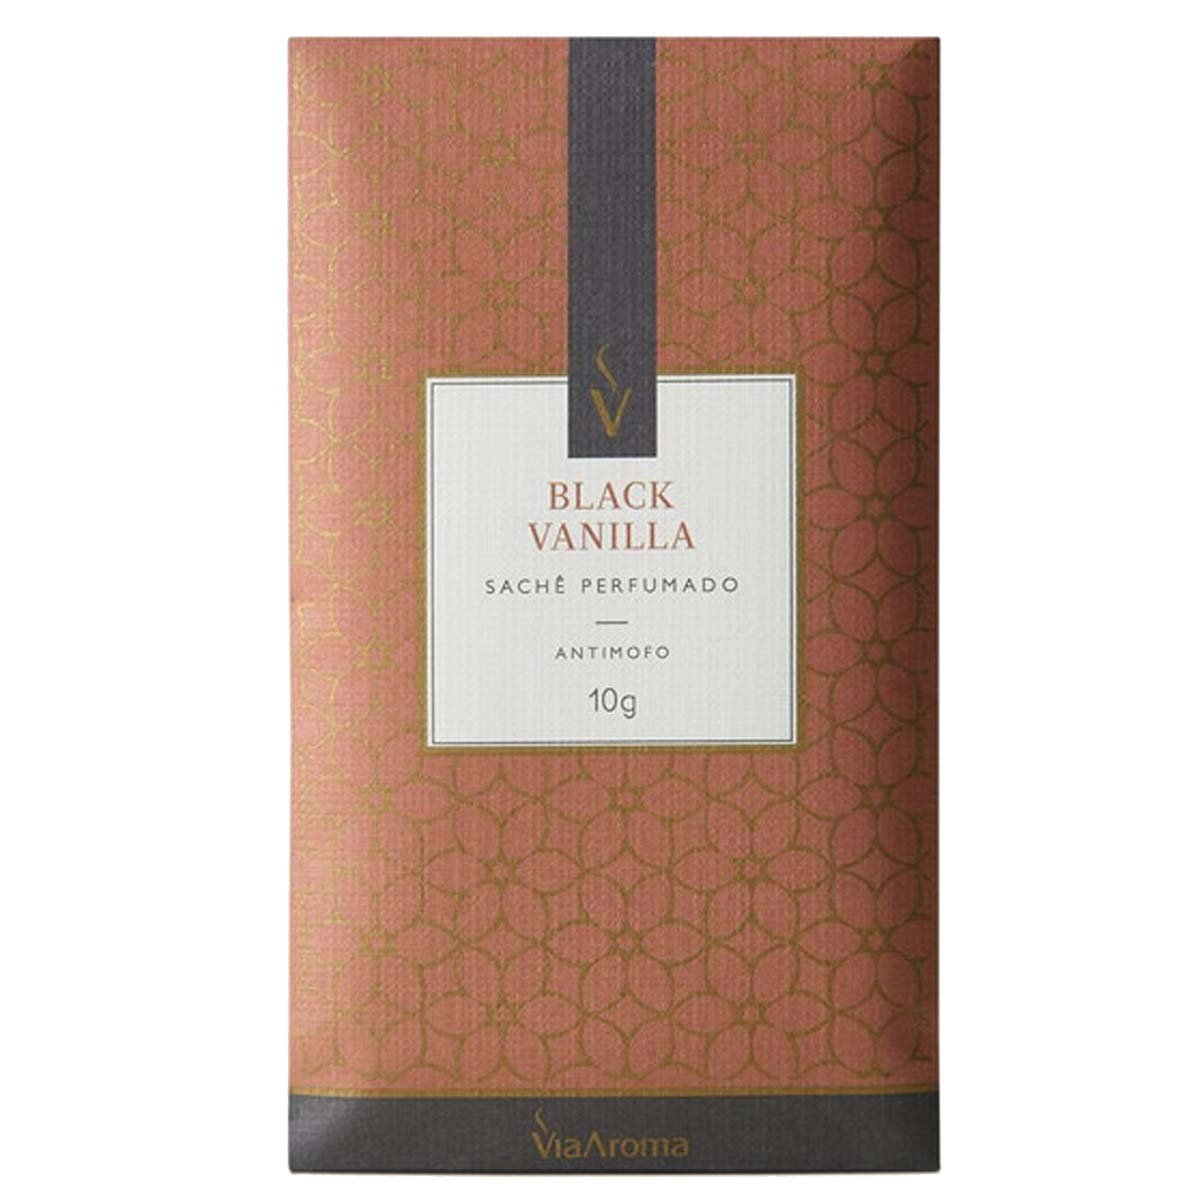 Sachê perfumado black vanilla 25g